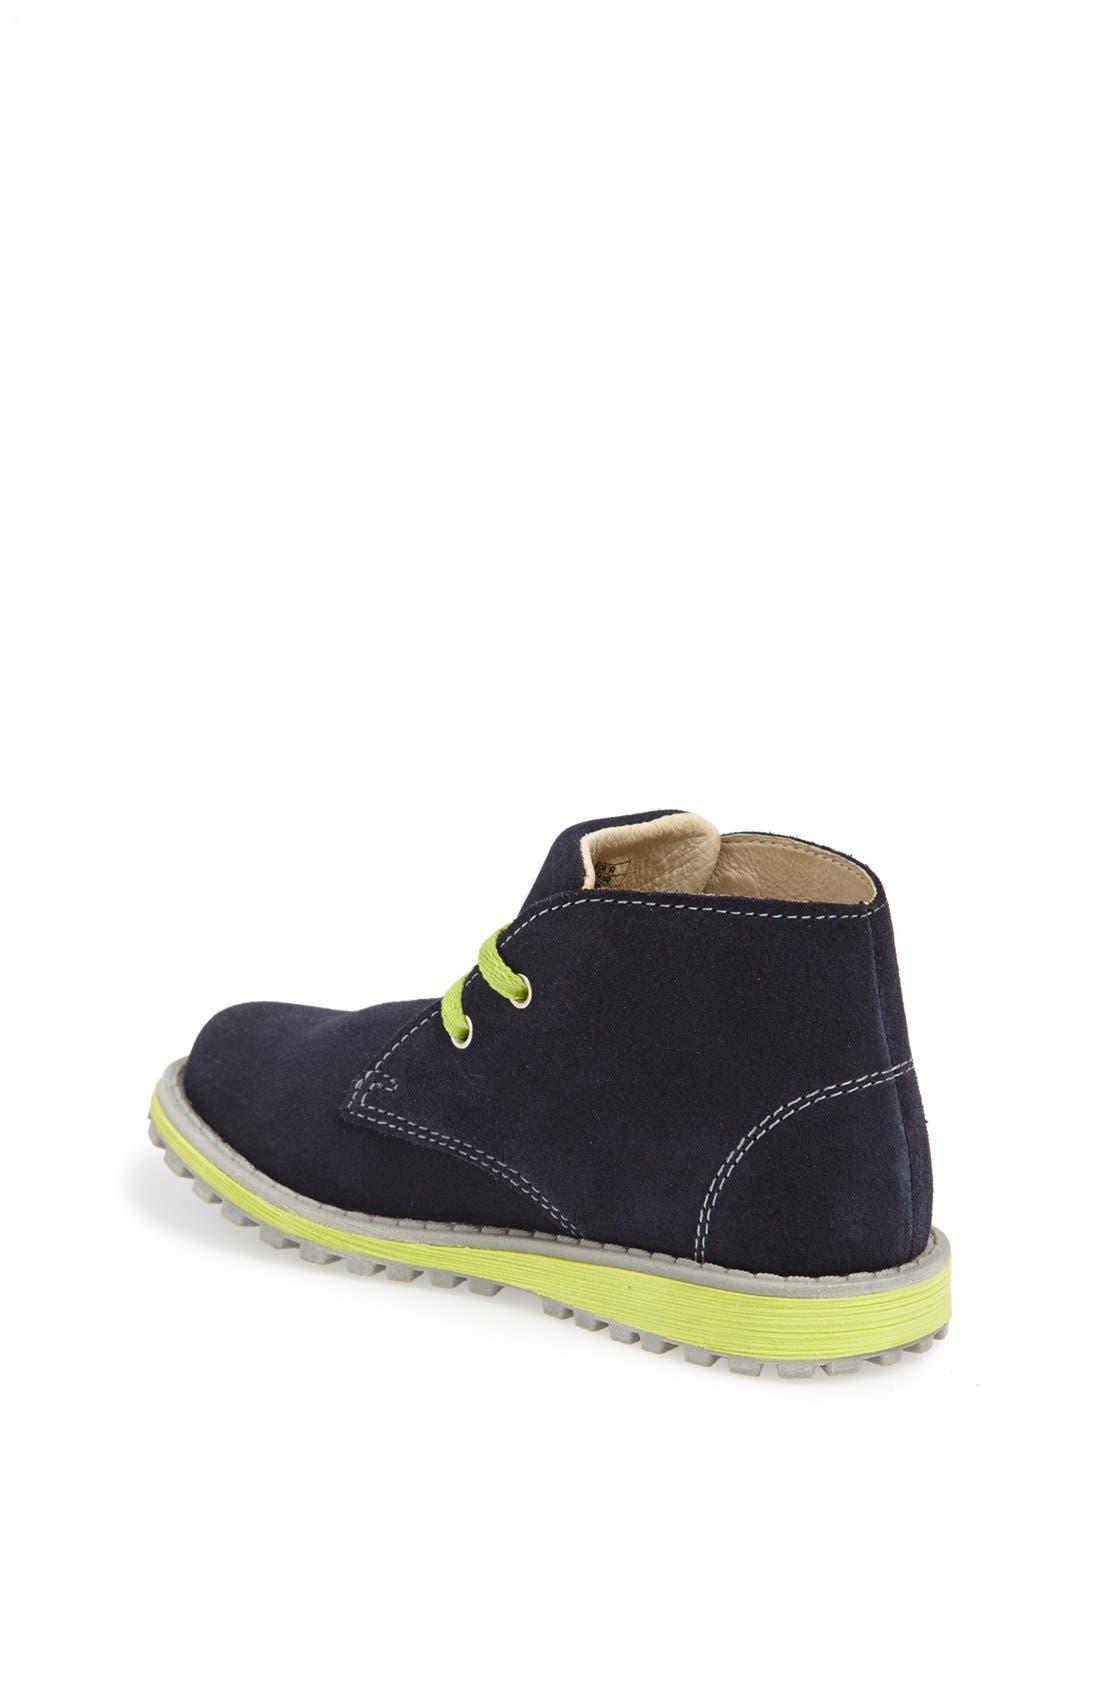 Alternate Image 2  - Umi 'Hector' Boot (Toddler & Little Kid)